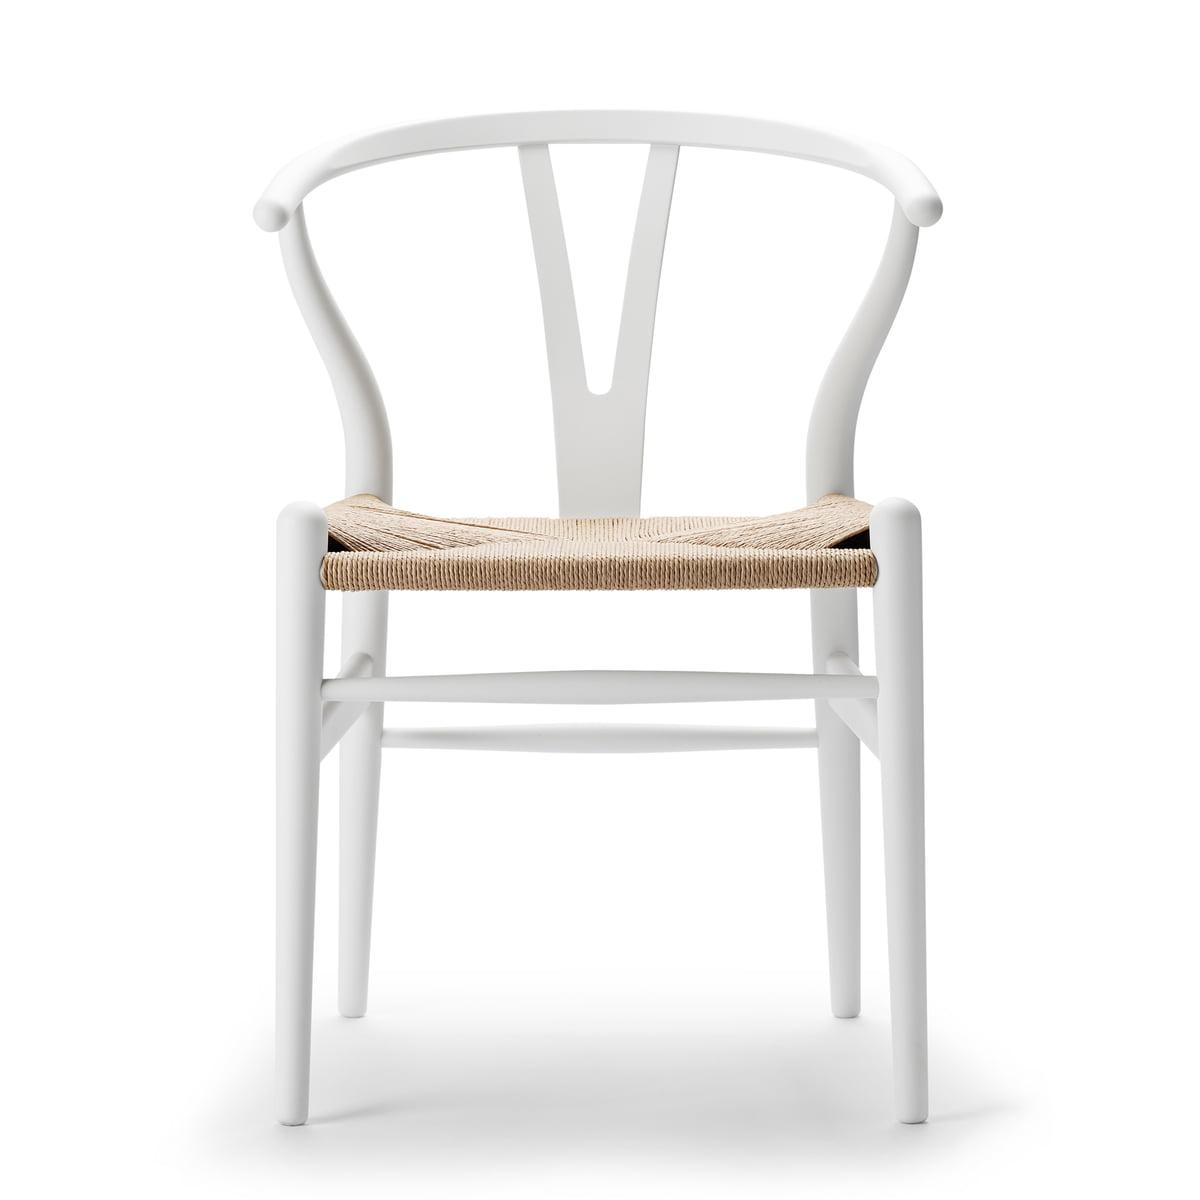 Carl Hansen - CH24 Wishbone Chair, soft white / Naturgeflecht (Limited Edition)